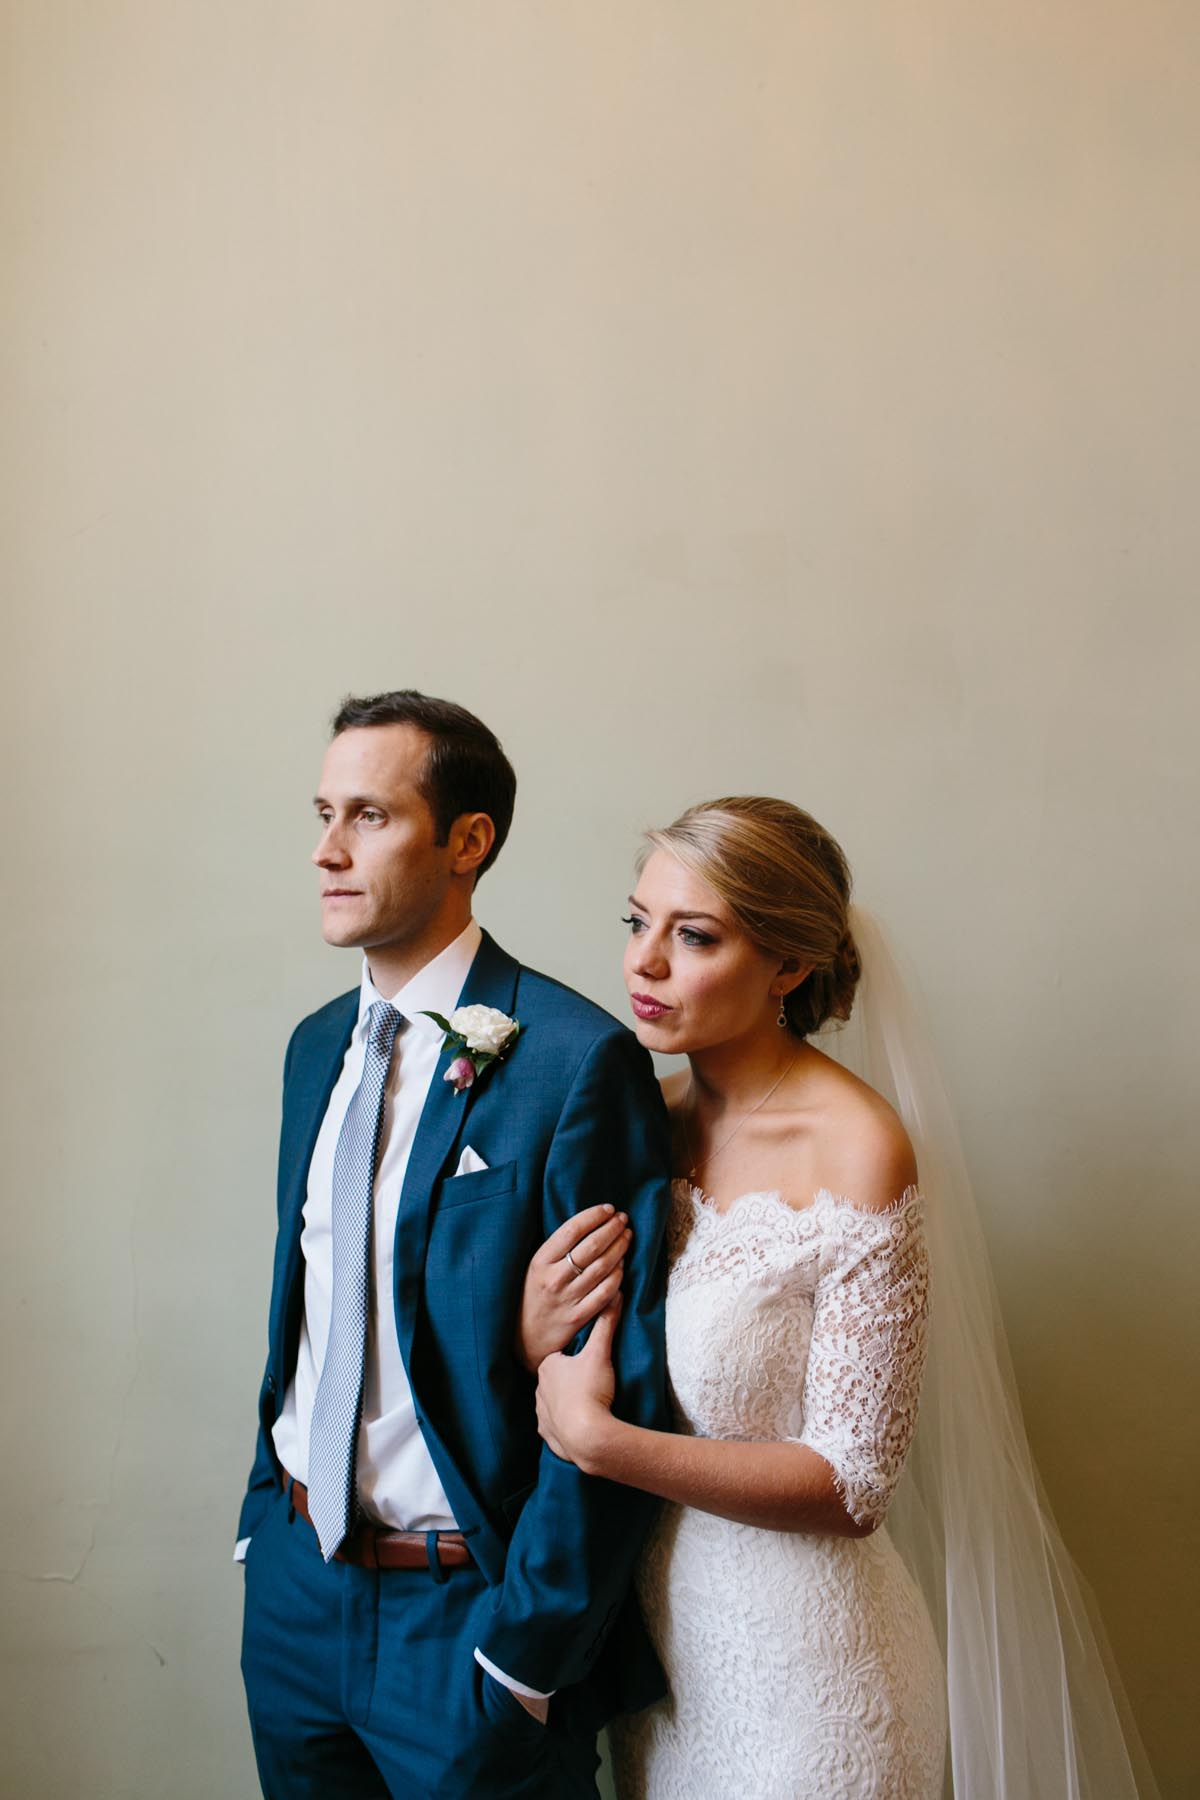 kjellman wedding blog biltmore wedding -43